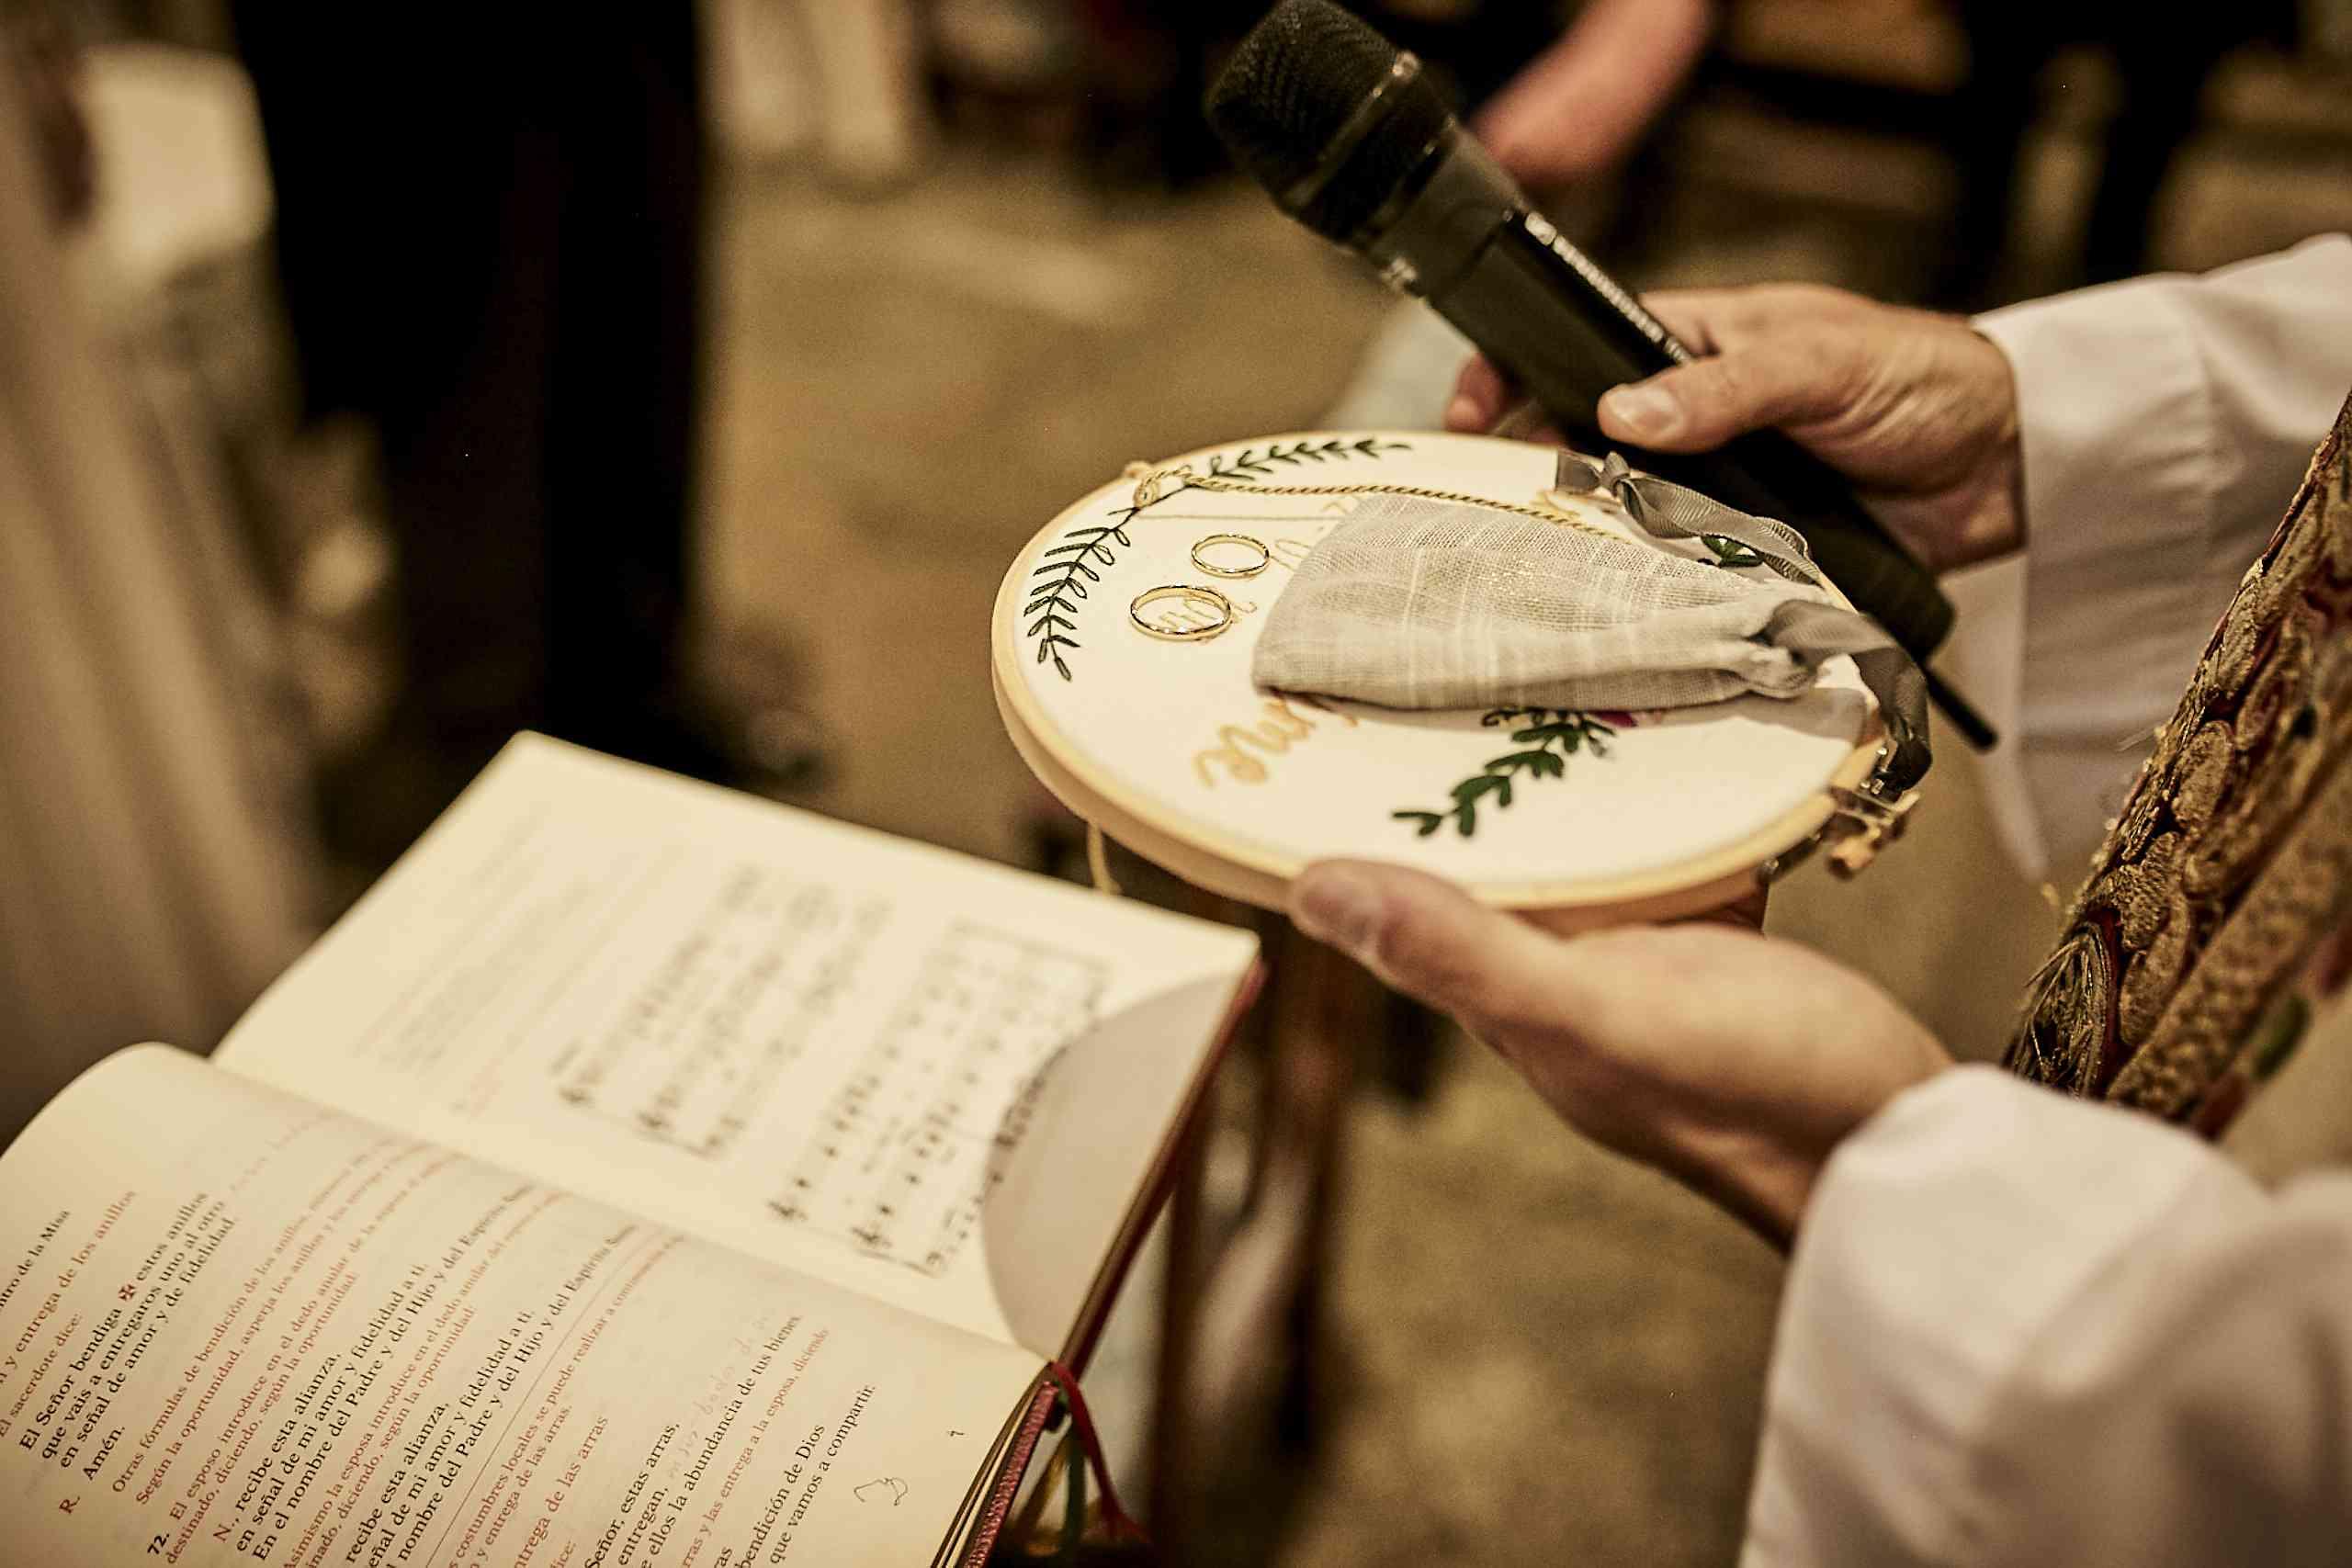 Catholic priest blessing rings